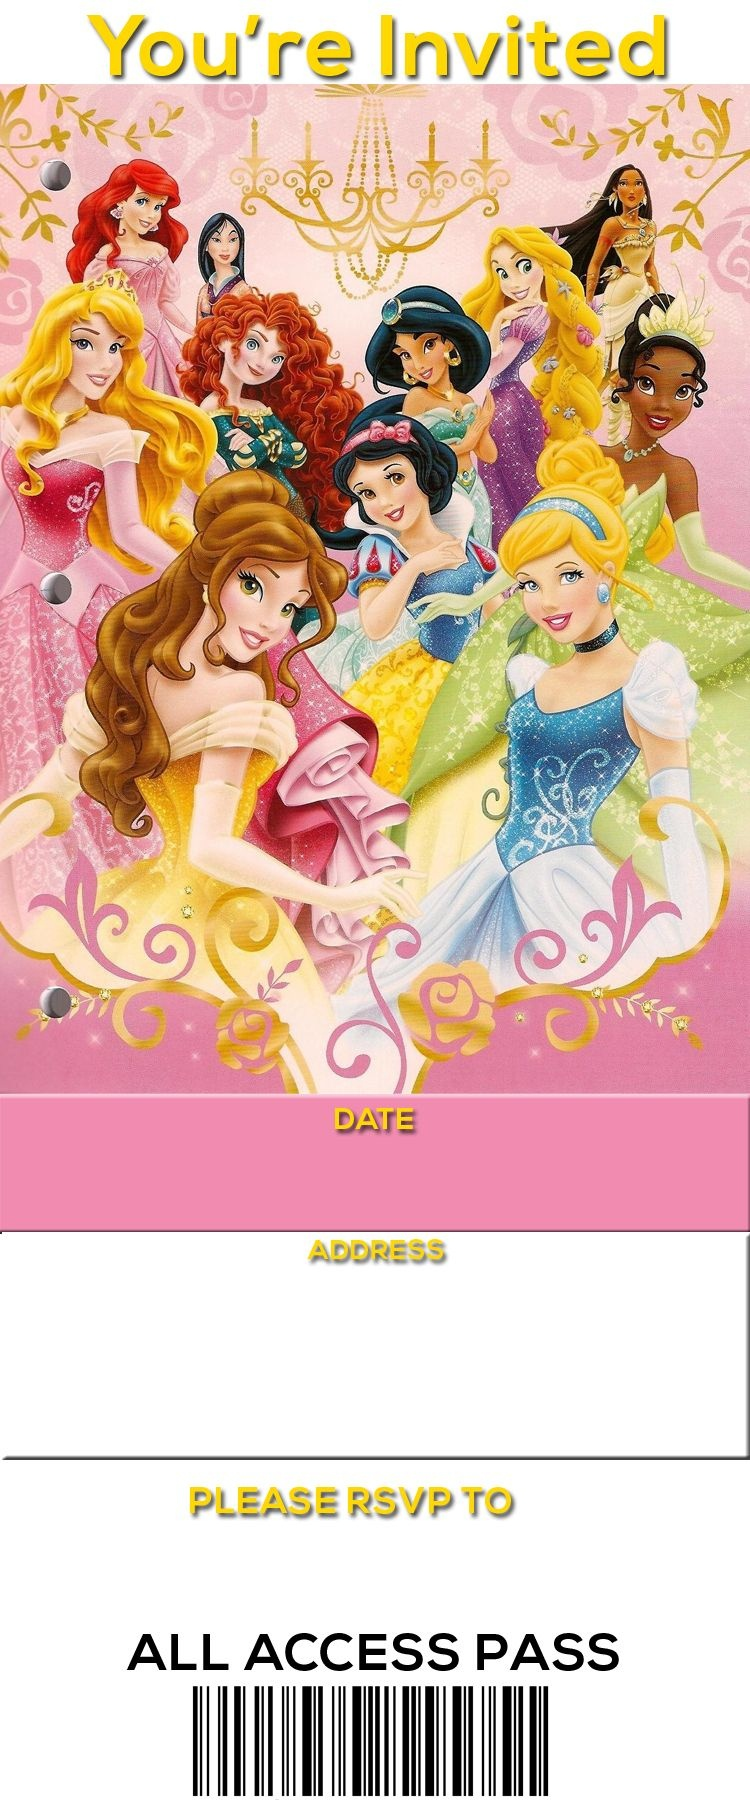 Free Printable Disney Princess Ticket Invitation | Free Printable - Disney Princess Birthday Invitations Free Printable